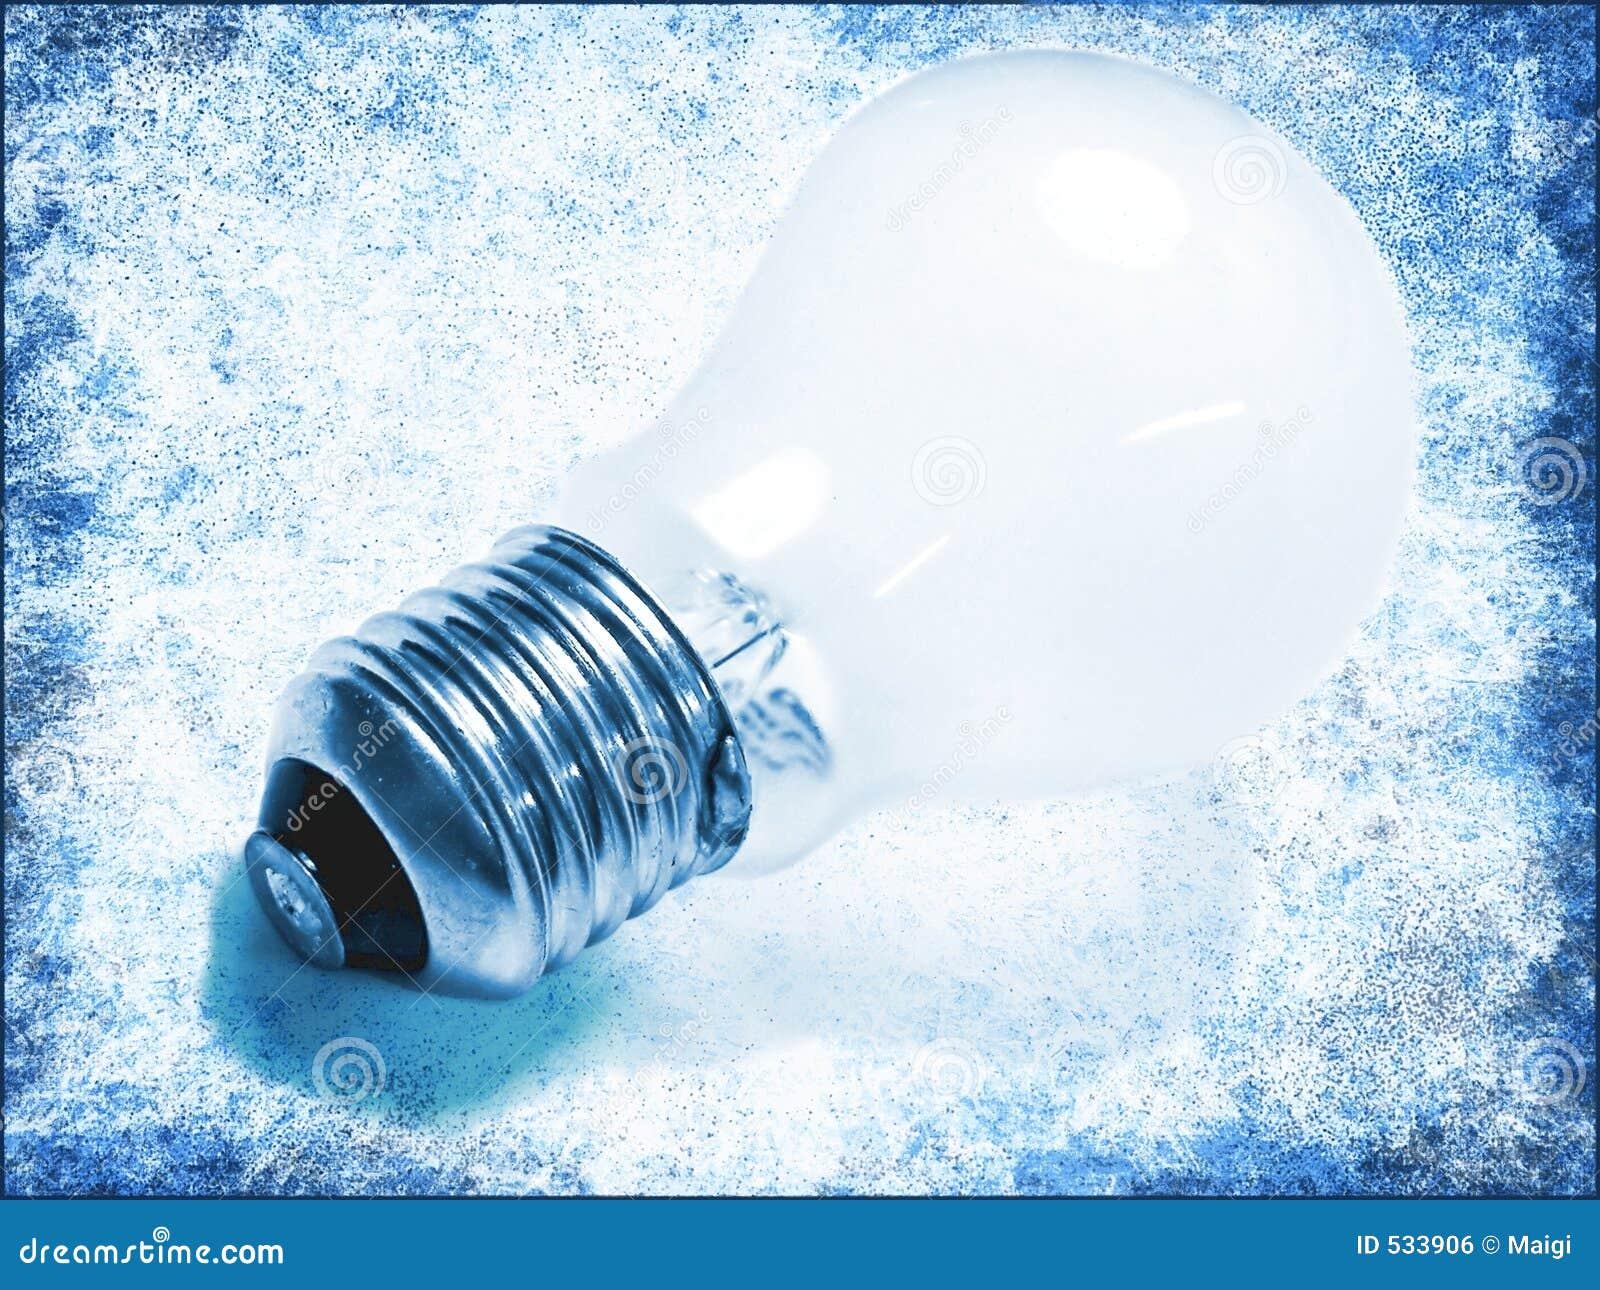 Download 蓝色电灯泡光 库存例证. 插画 包括有 商业, 权利, 营销, 次幂, 能源, 智能, 尤里卡, 照亮, bulfinch - 533906